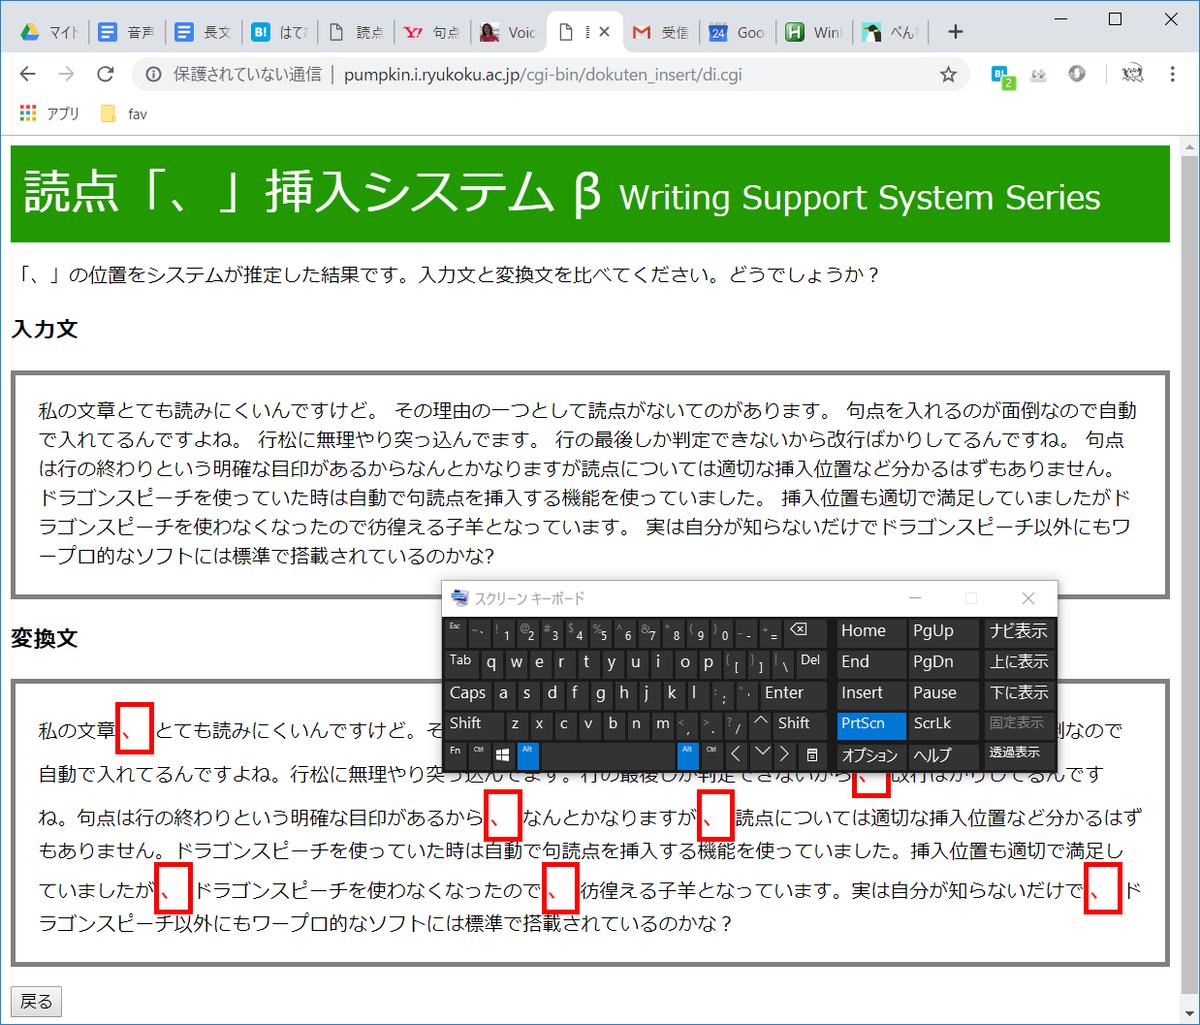 f:id:yasushiito:20190324092803p:plain